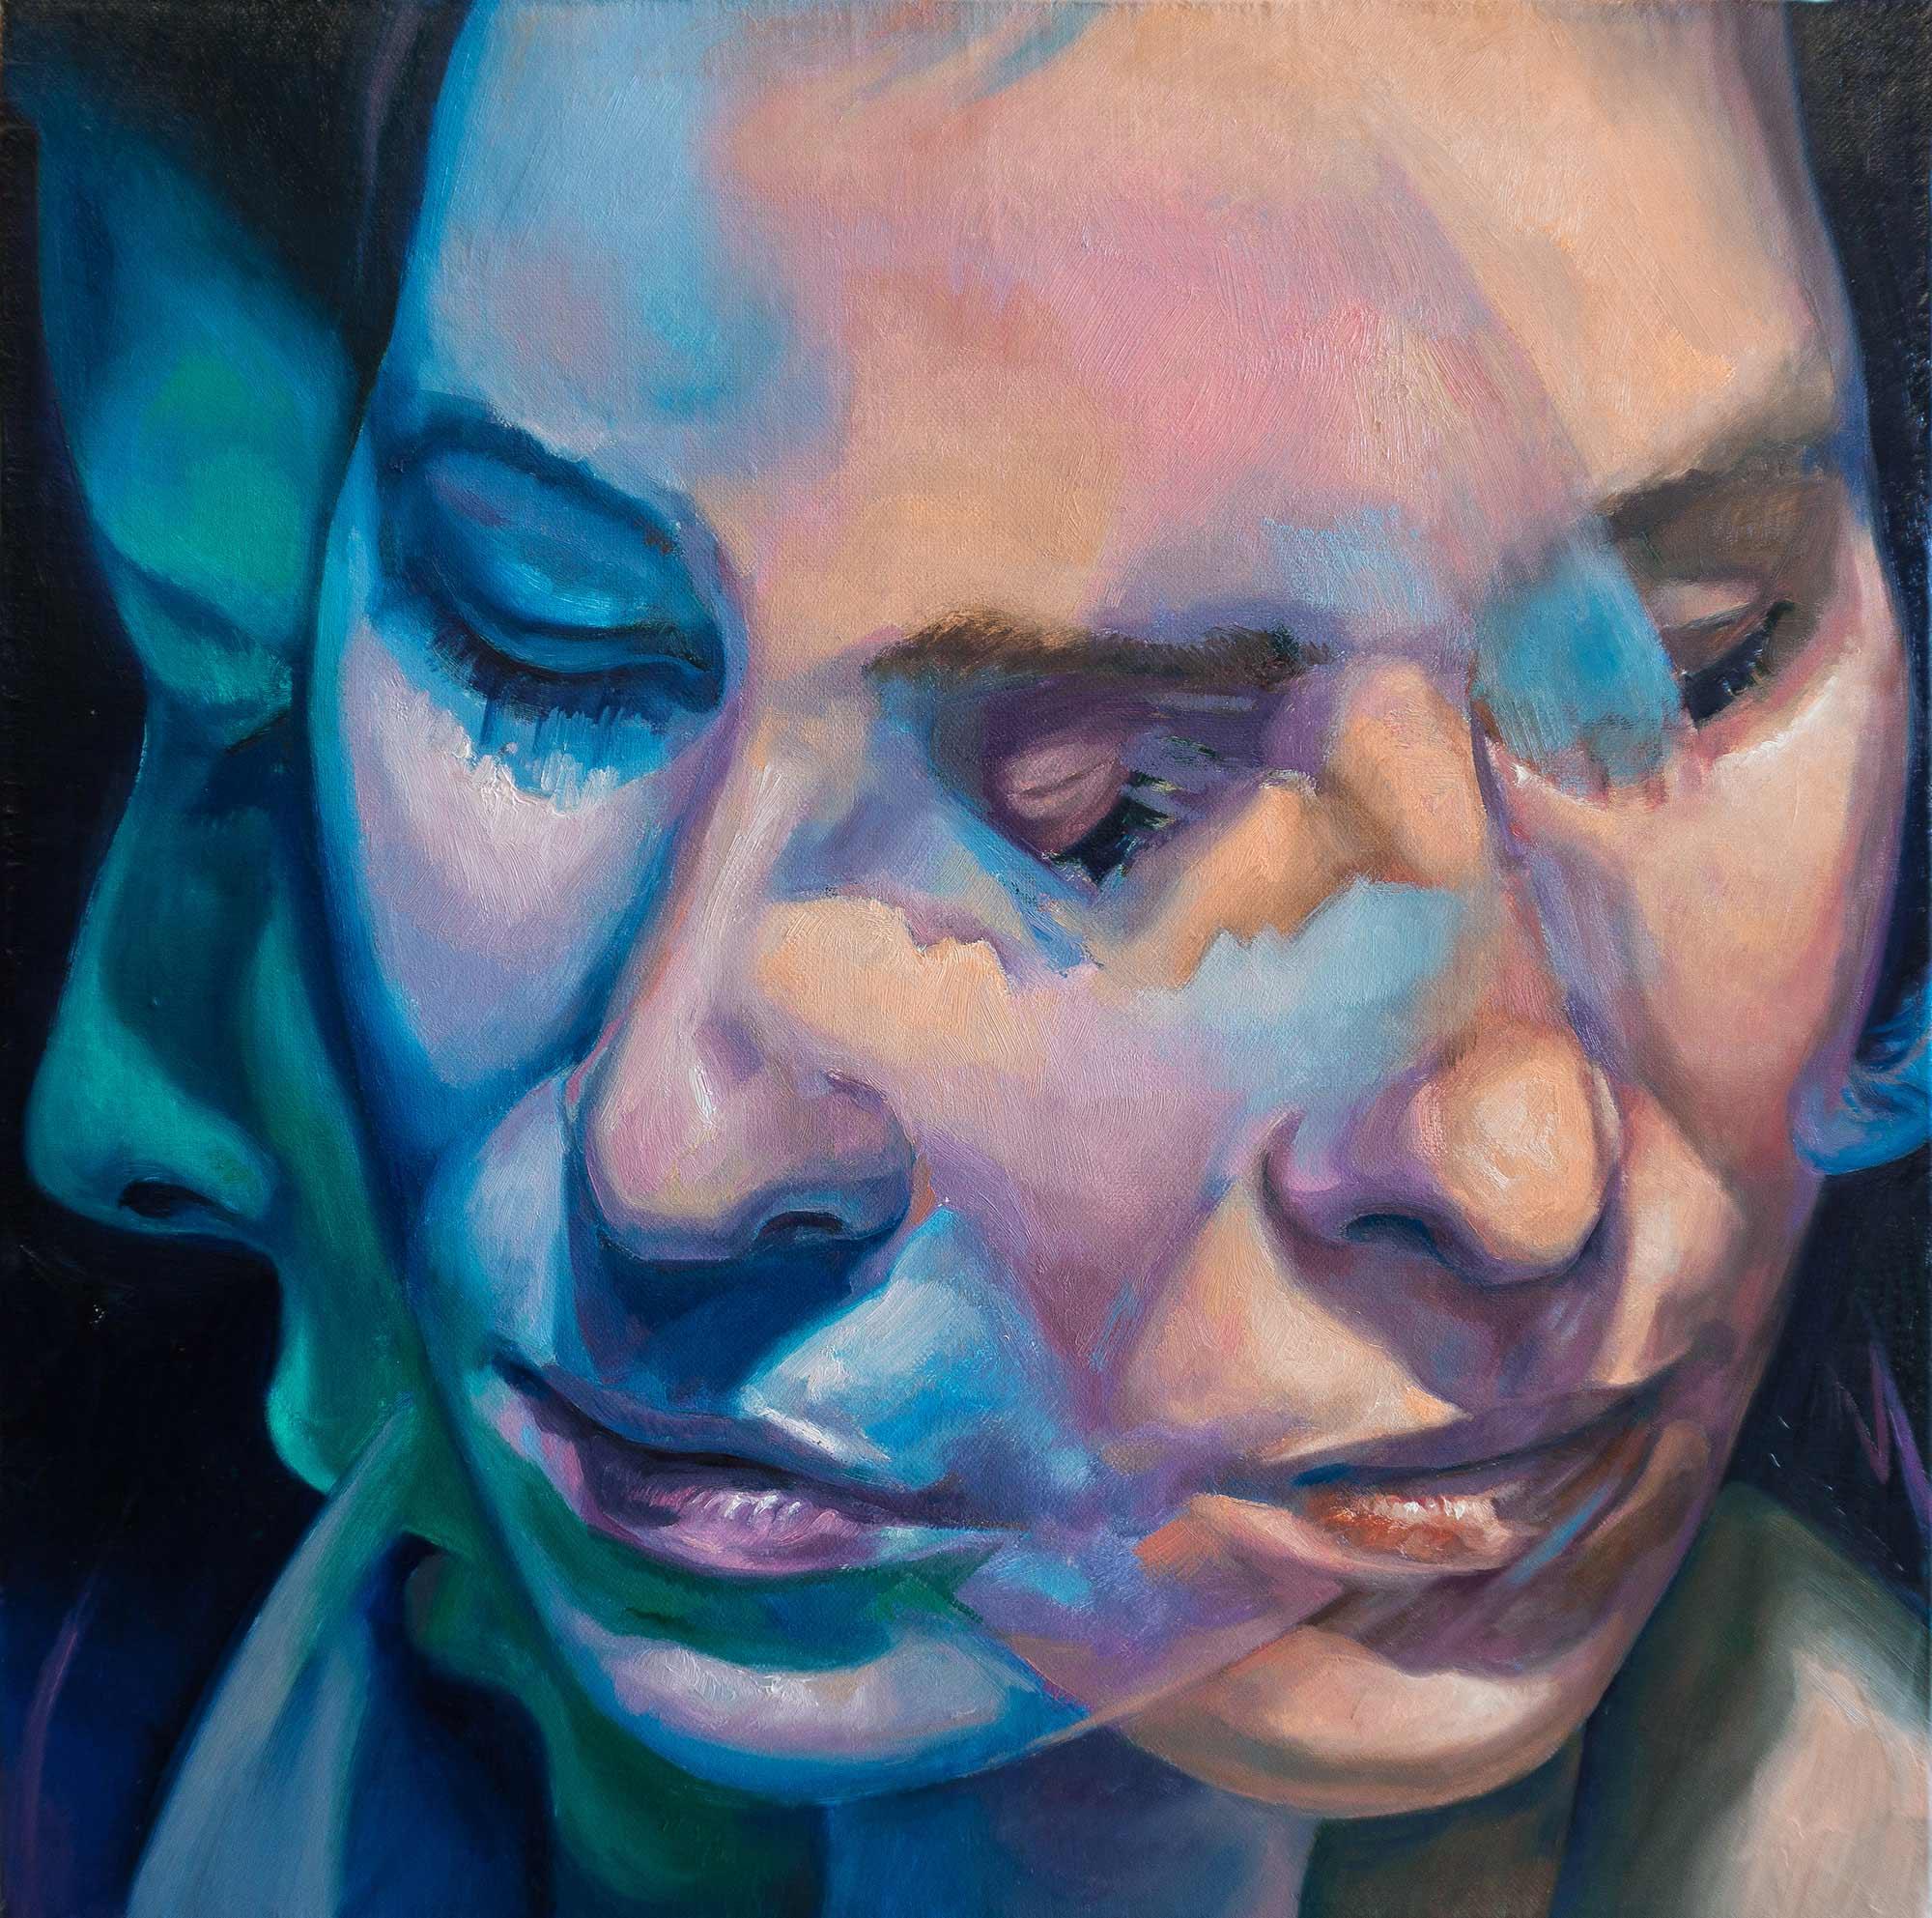 Scott Hutchison's - Slipping Away